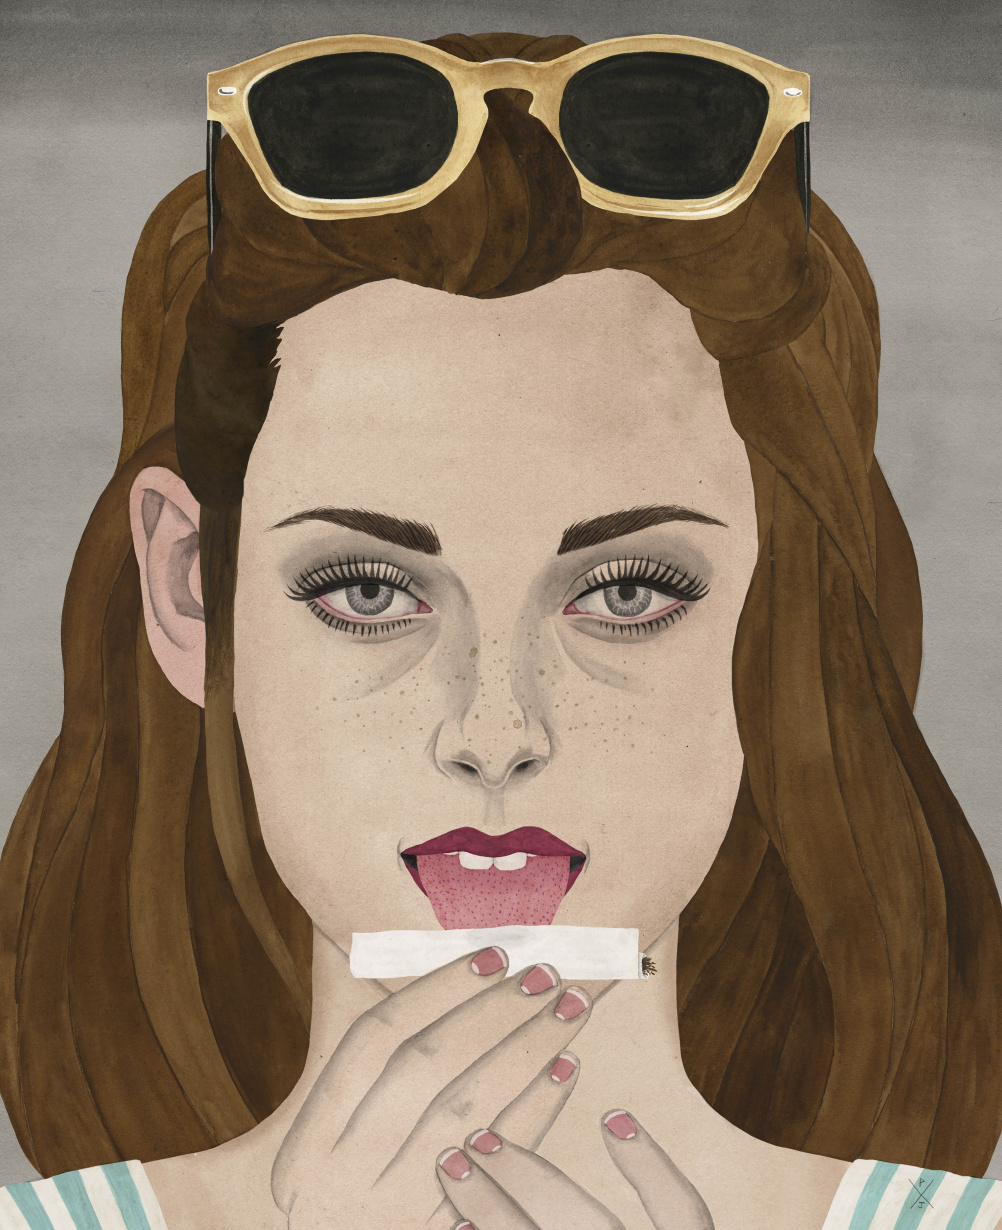 Kristen Stewart, Paul X Johnson